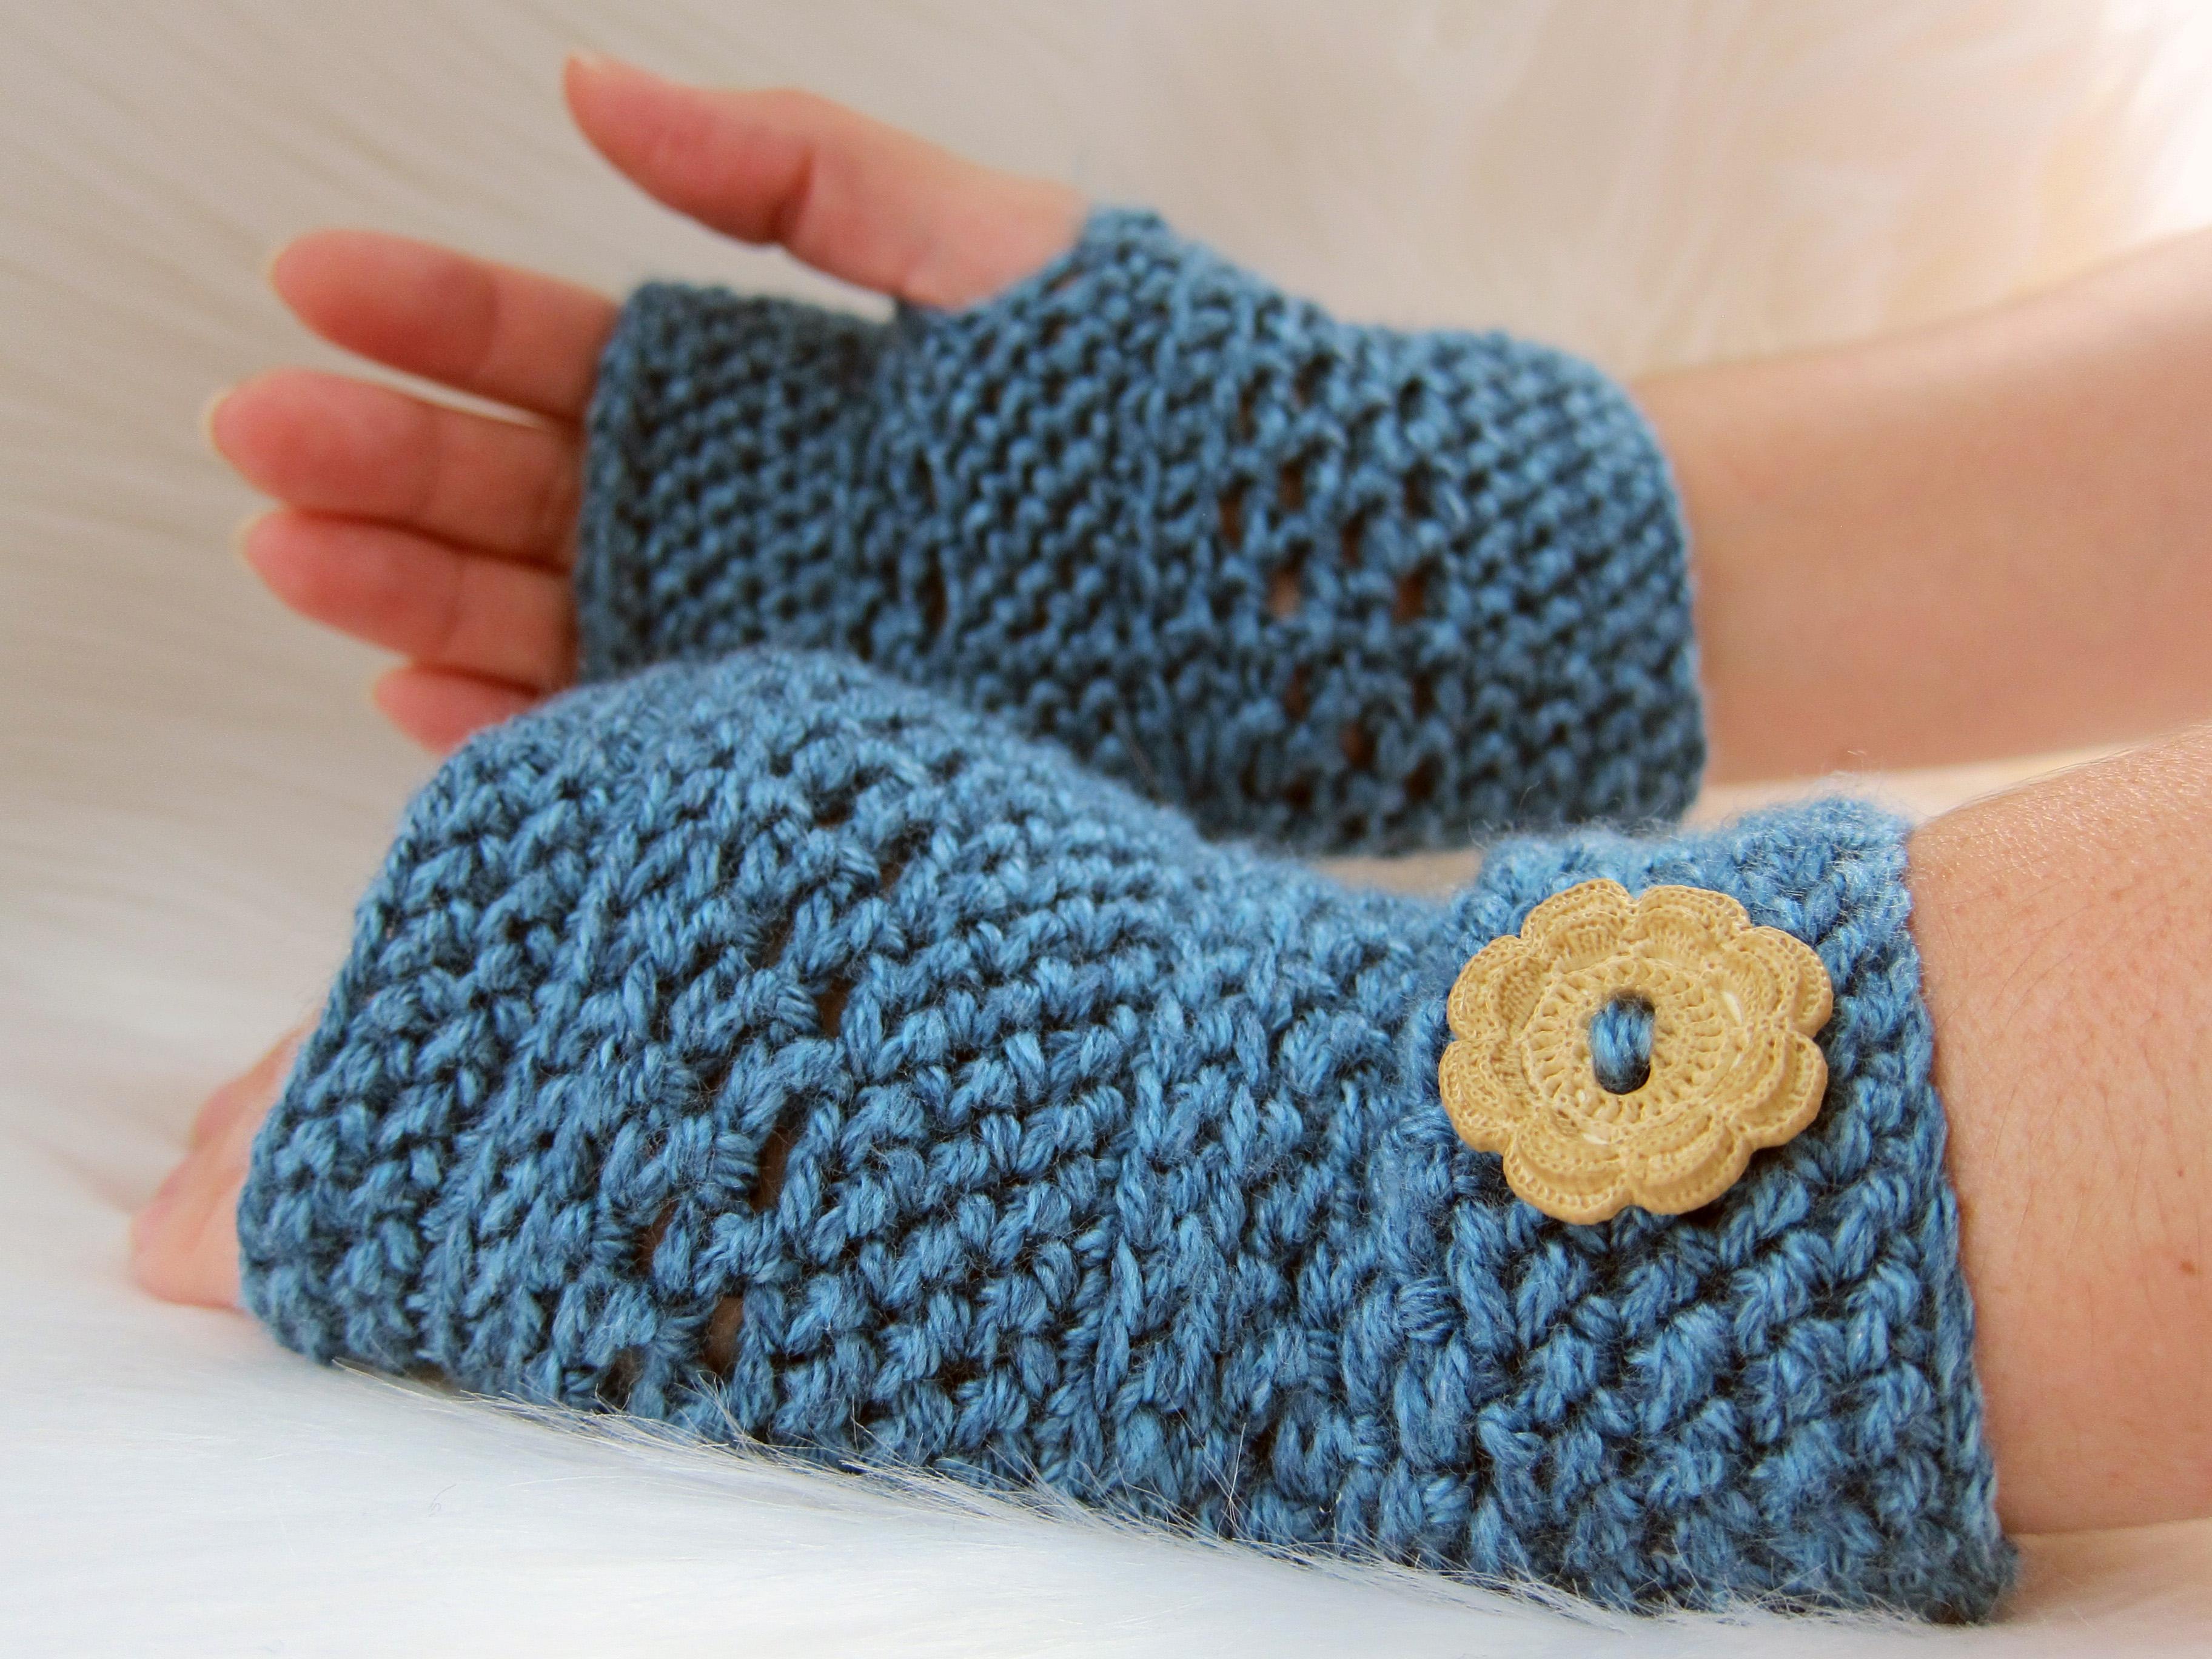 Crochet Fingerless Gloves by NorthEastMama